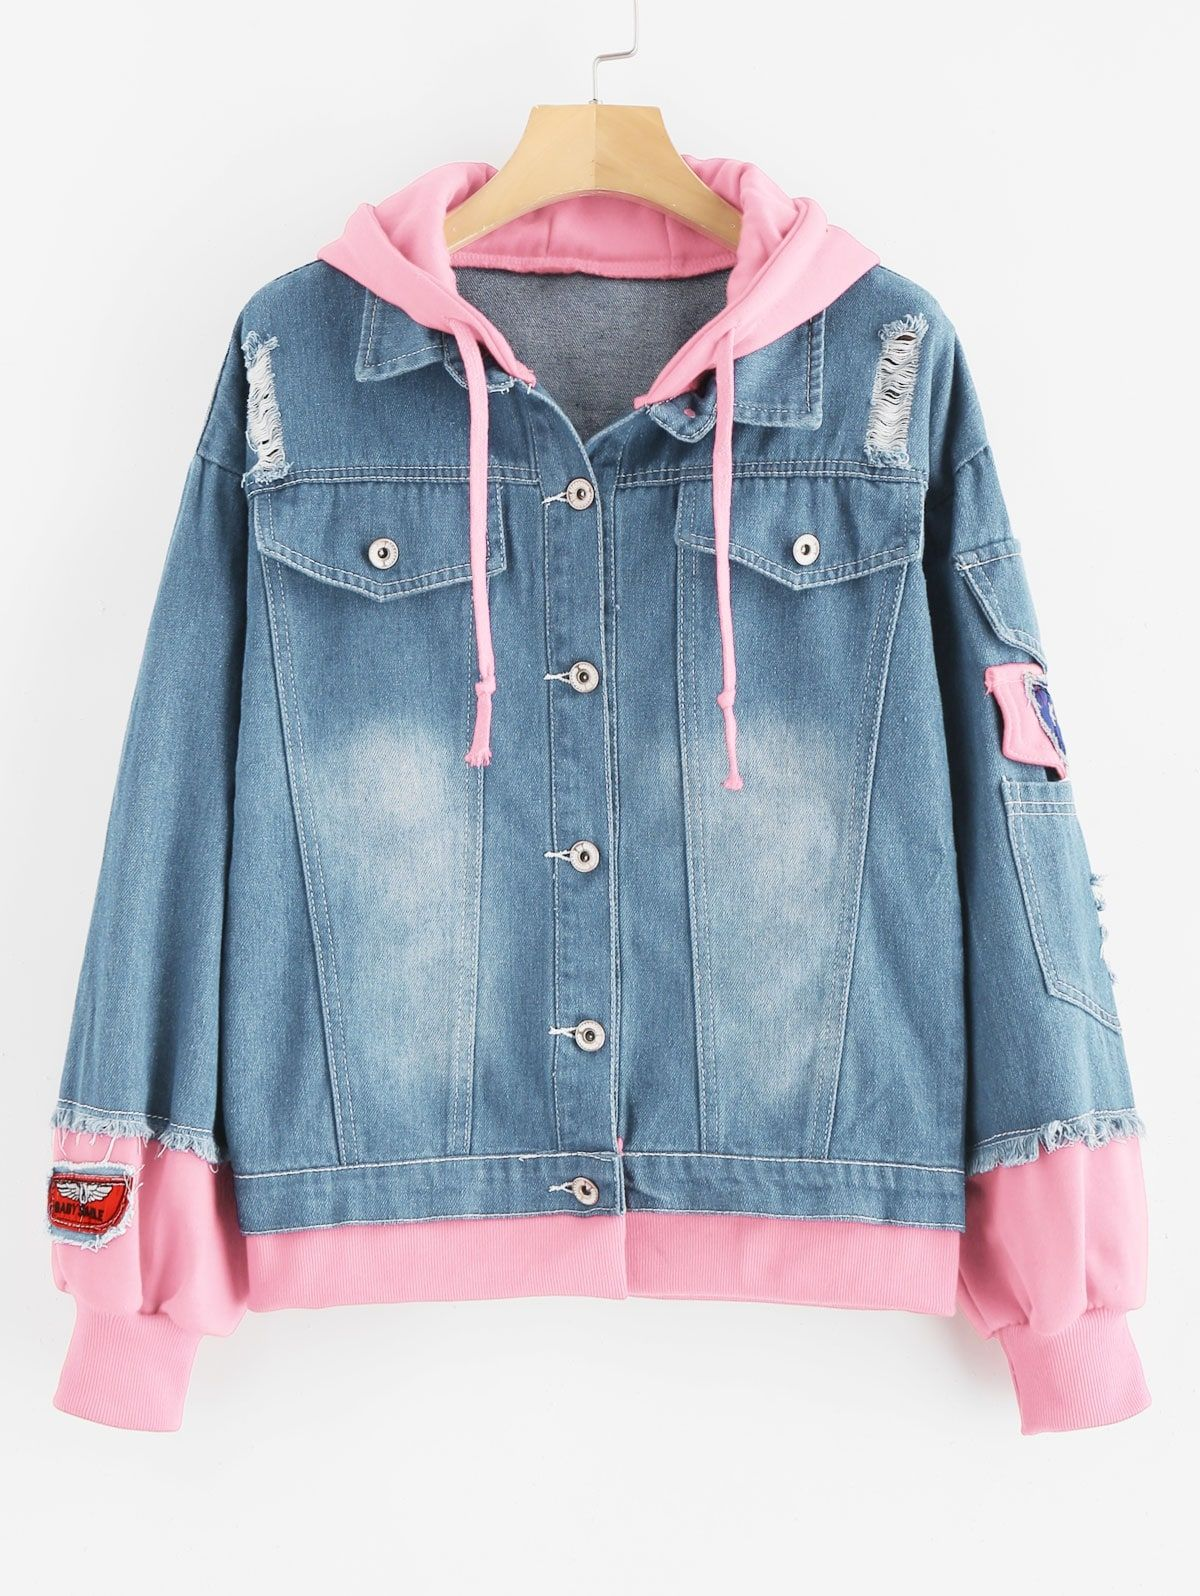 Distressed Hooded Denim Jacket Denim Blue Gray Pink Red Sakura Pink Ad Jacket Denim Denim Distr Hooded Denim Jacket Cute Skirt Outfits Denim Jacket [ 1596 x 1200 Pixel ]